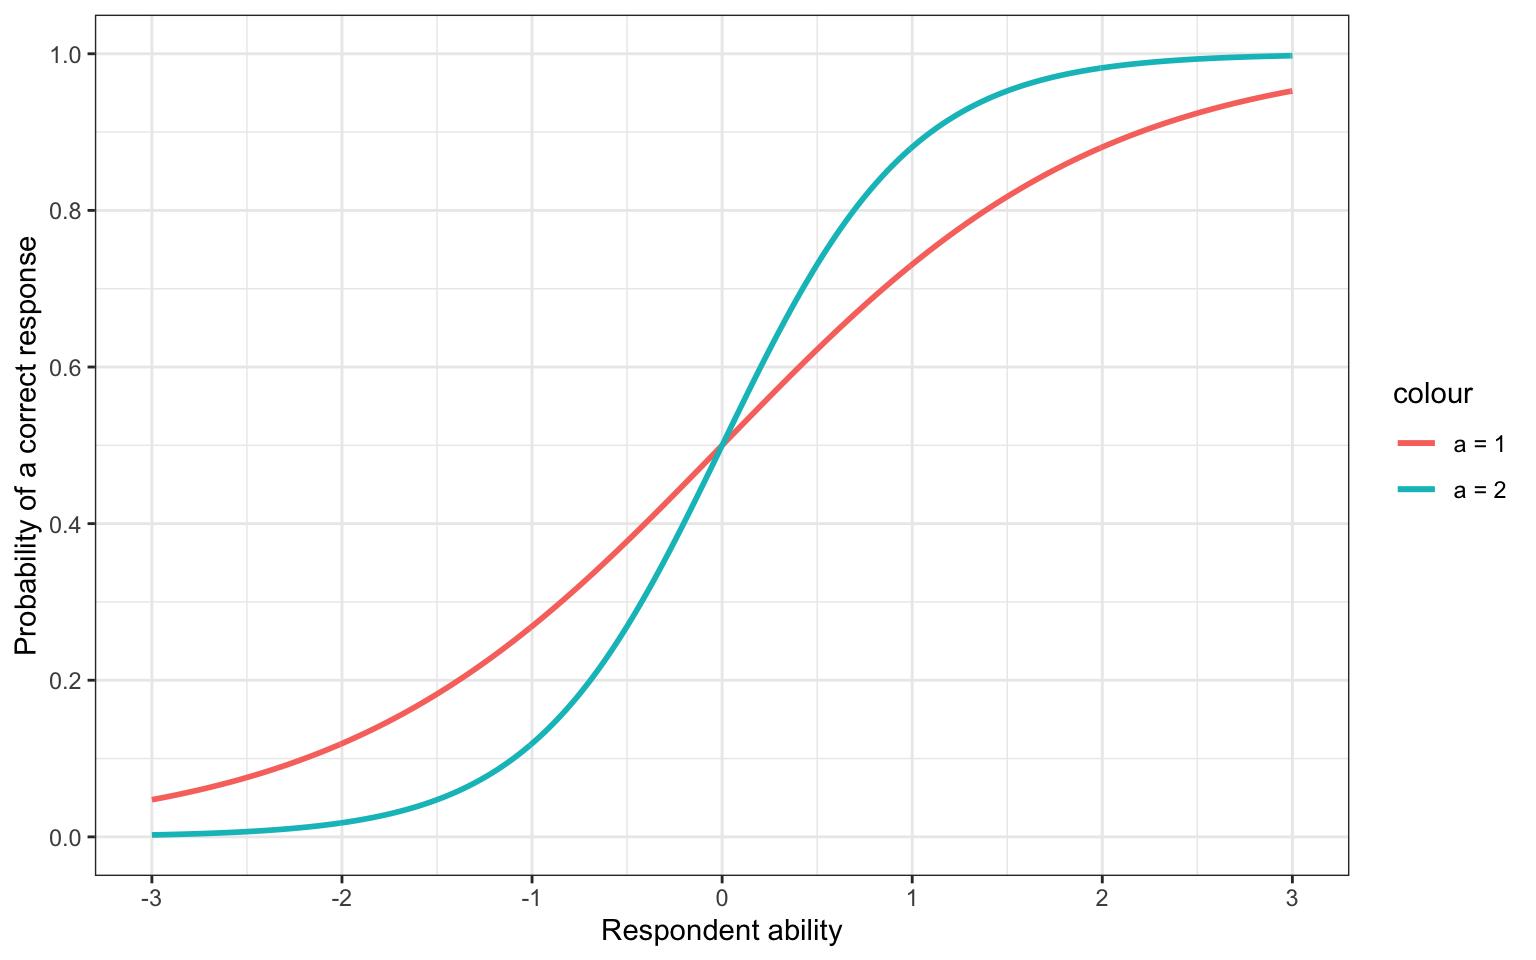 Shifting the a parameter